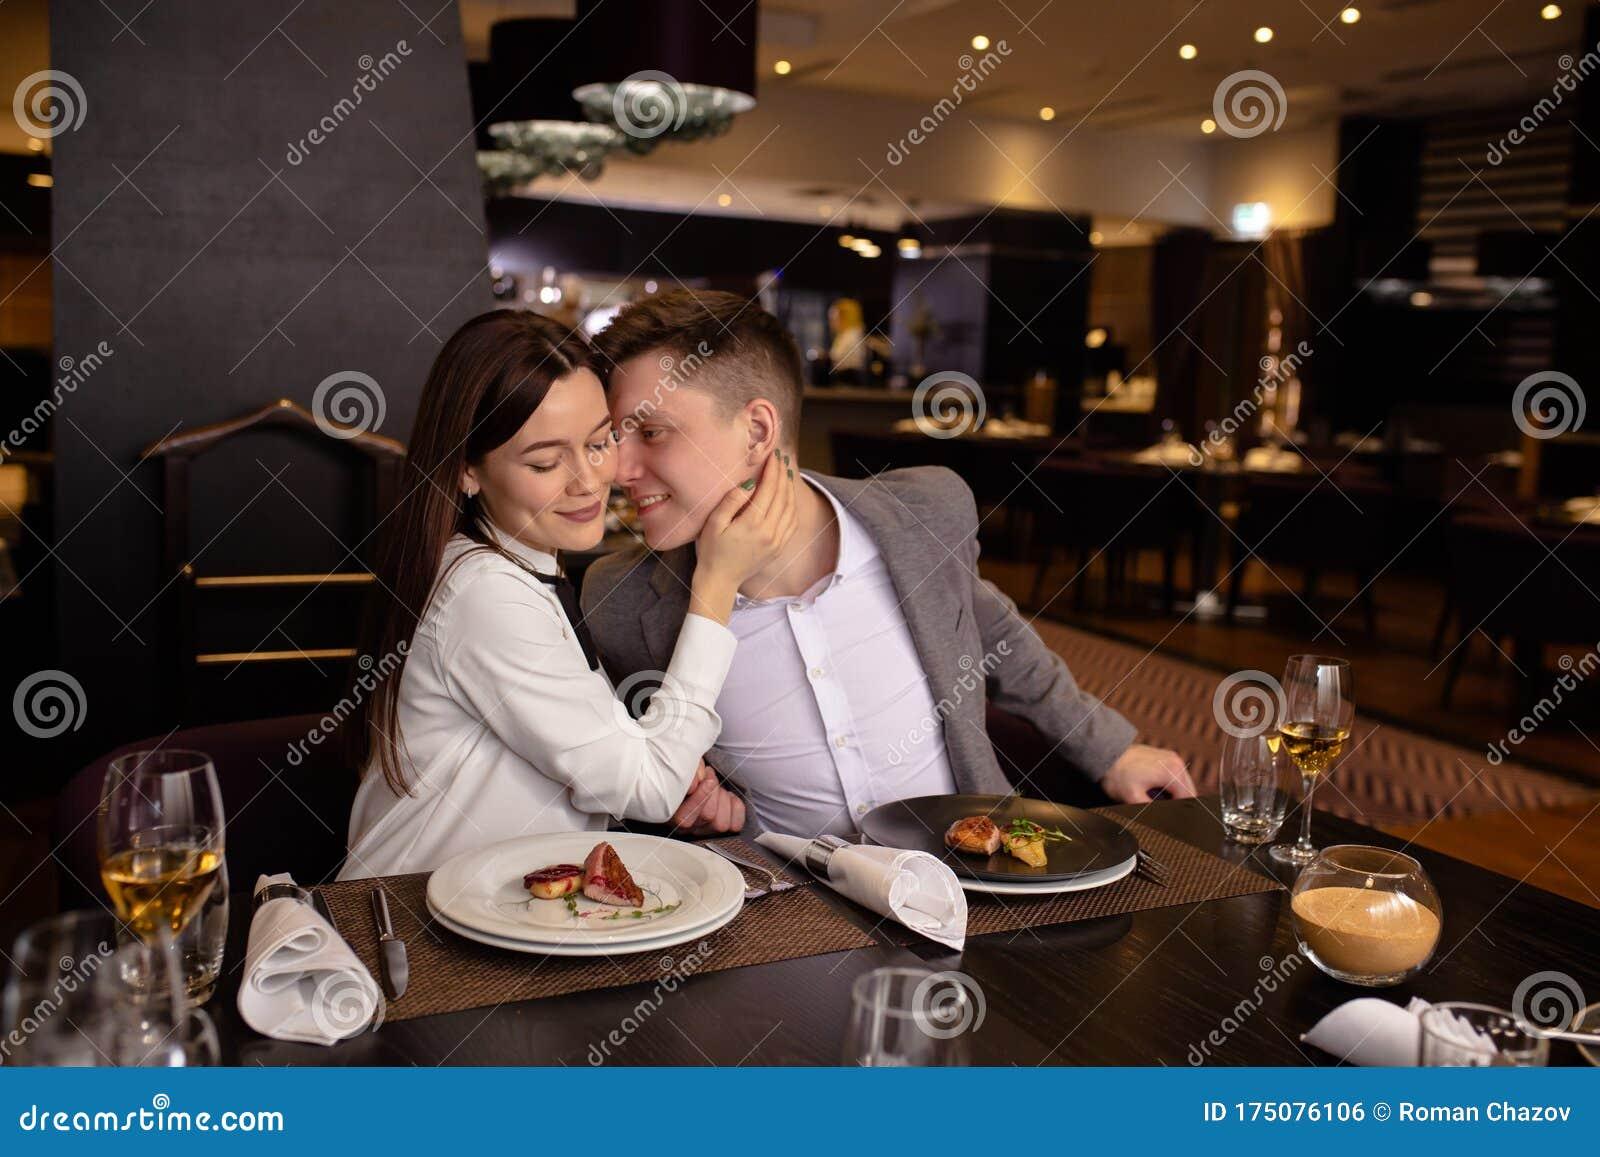 Attractive Caucasian Couple Enjoy Having Dinner In Luxury Restaurant Stock Photo Image Of Cheerful Relationships 175076106